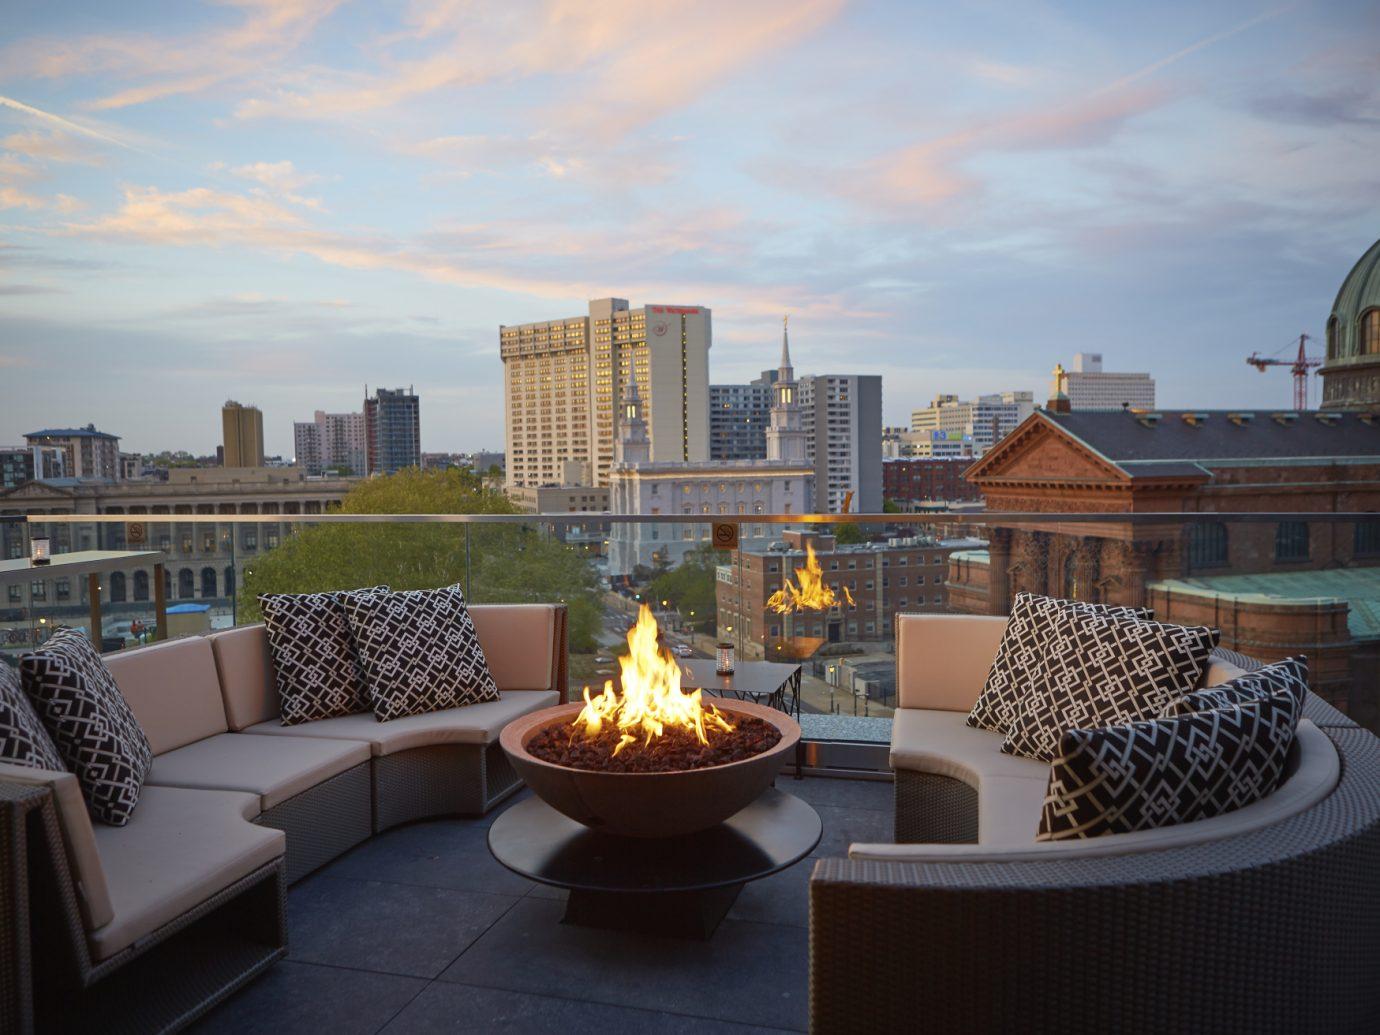 Assembly Rooftop, Philadelphia